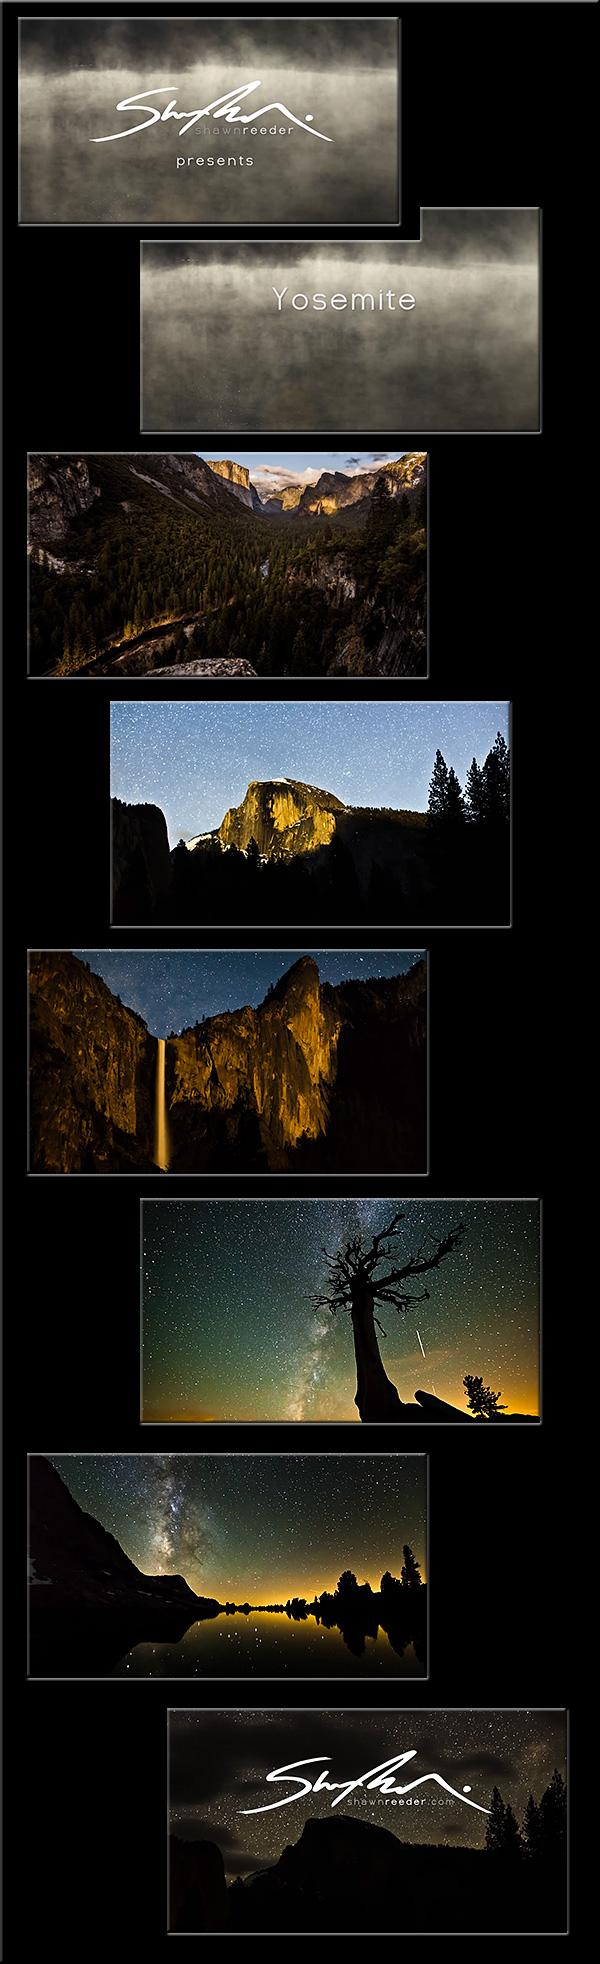 Yosemite Range of Light -- by Shawn Reeder